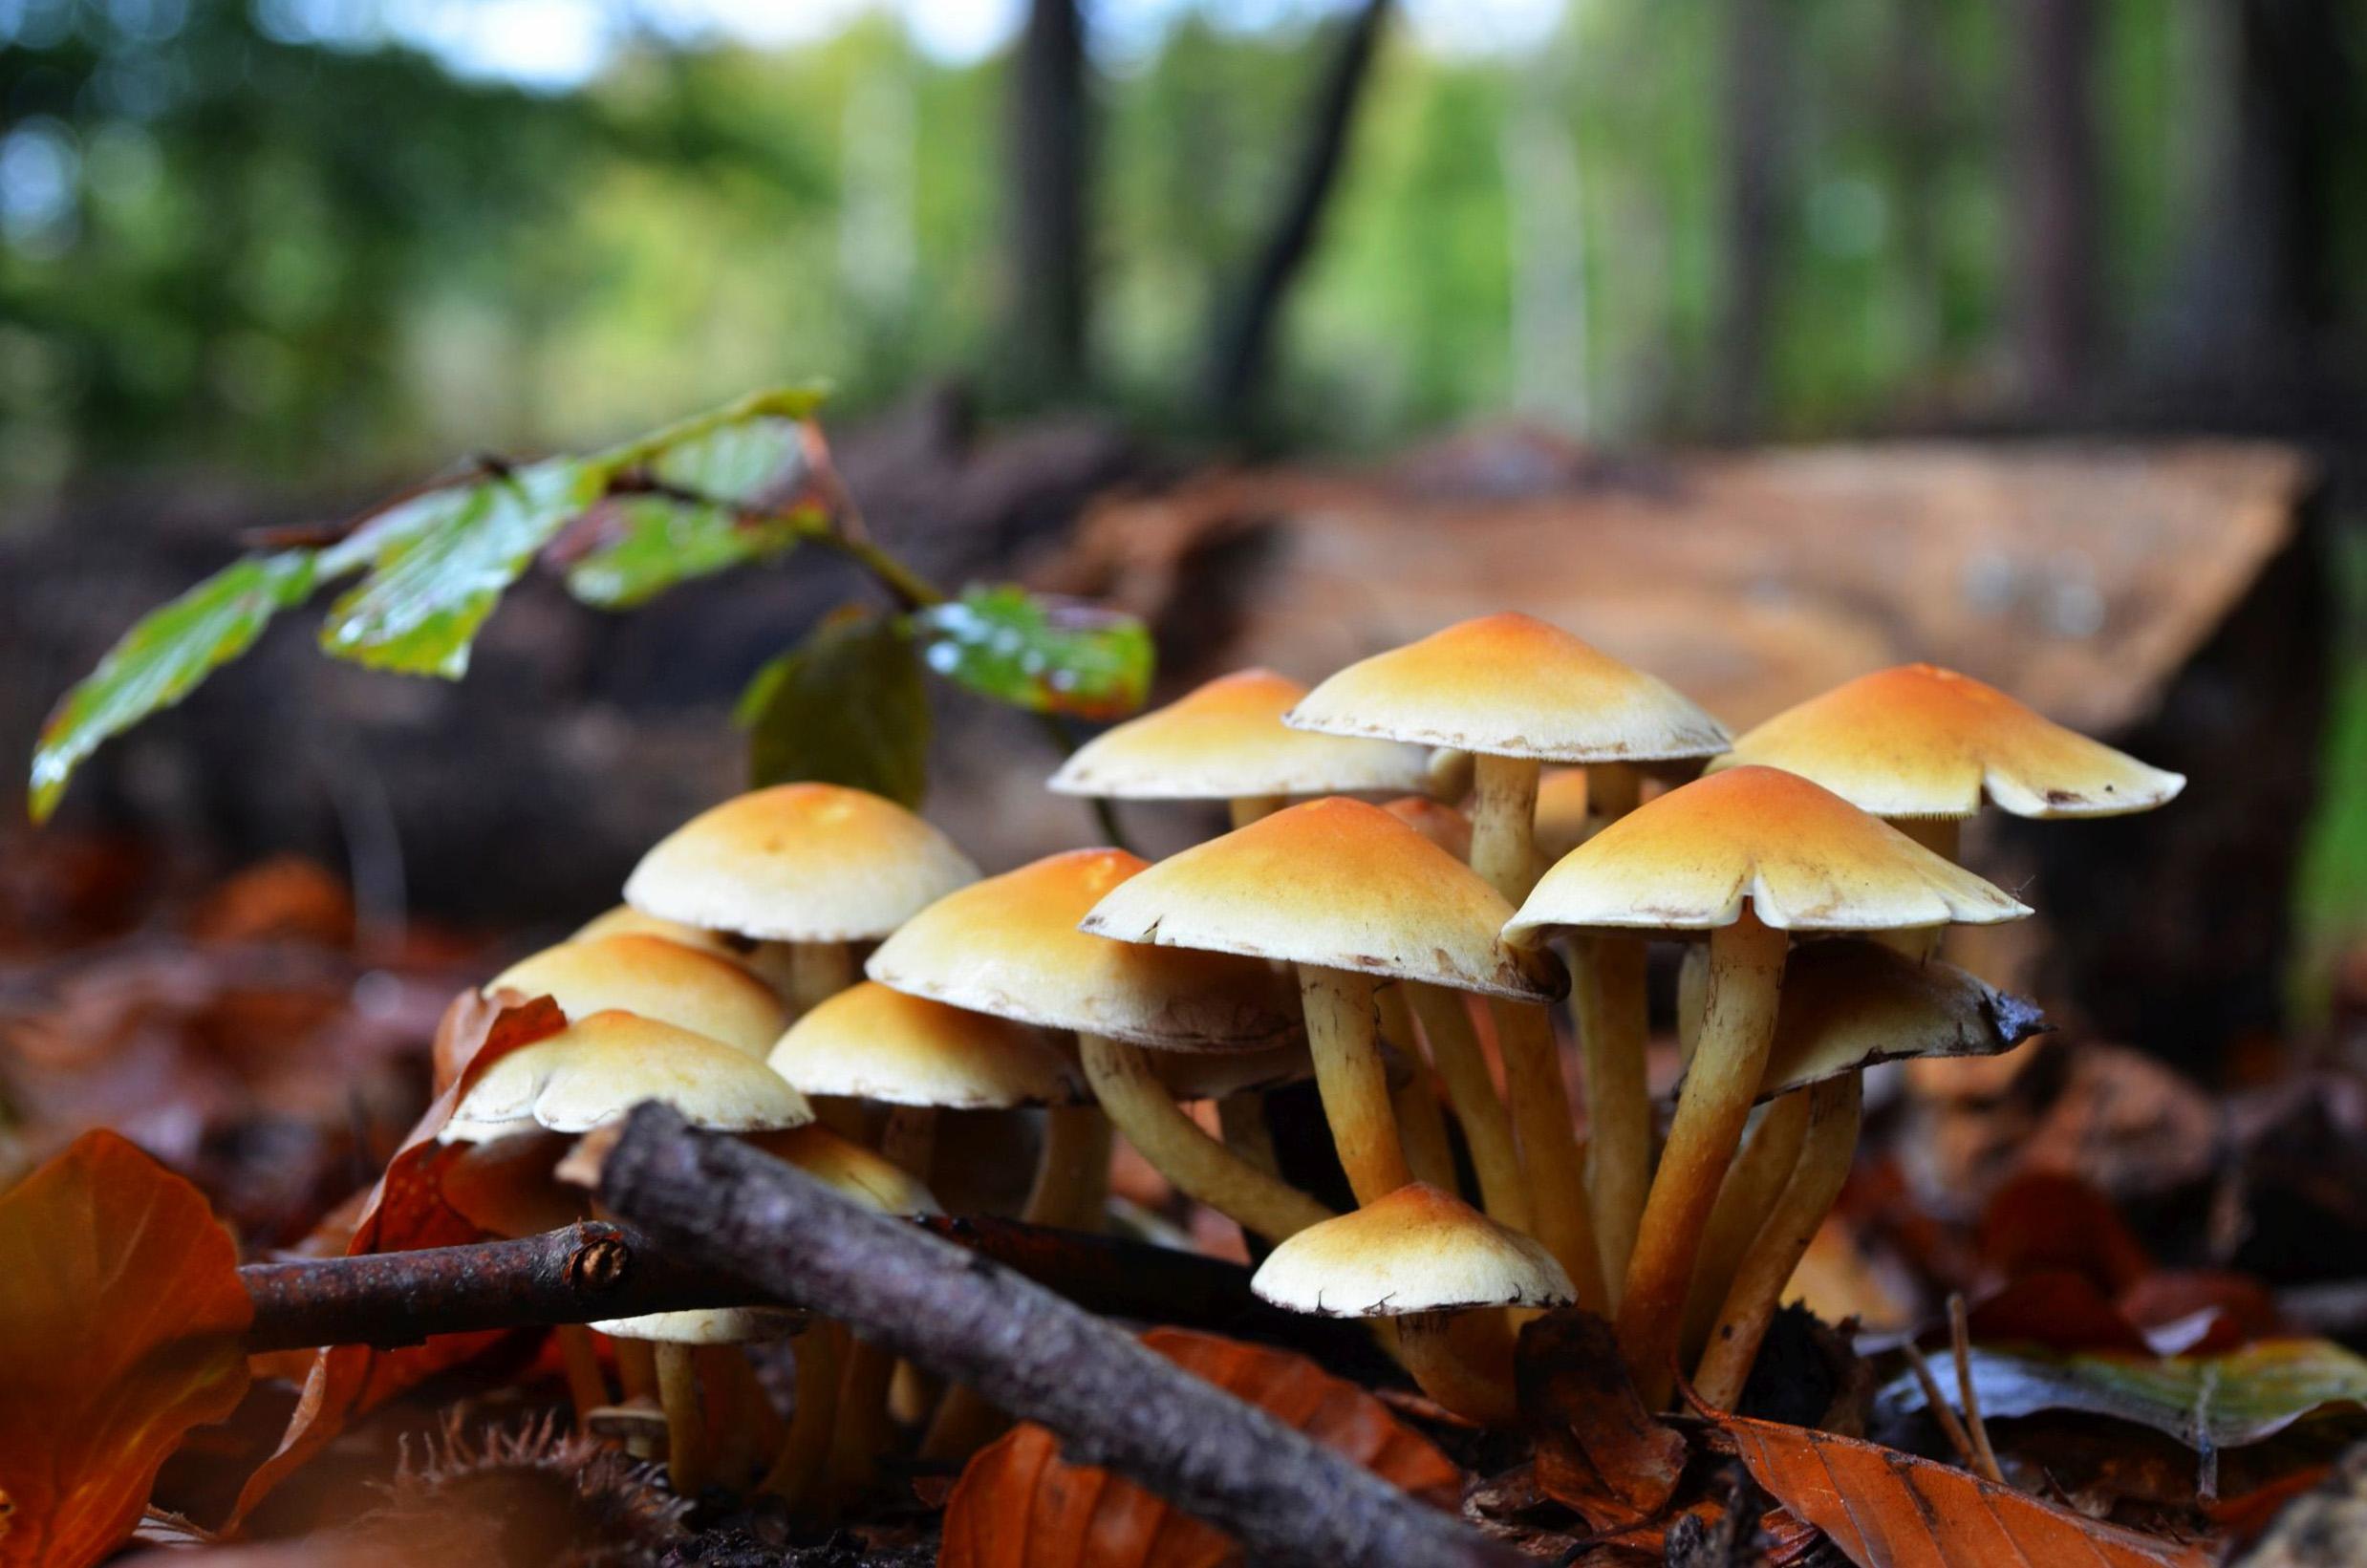 94 Fantastic Free Images For A Mushroom Wallpaper